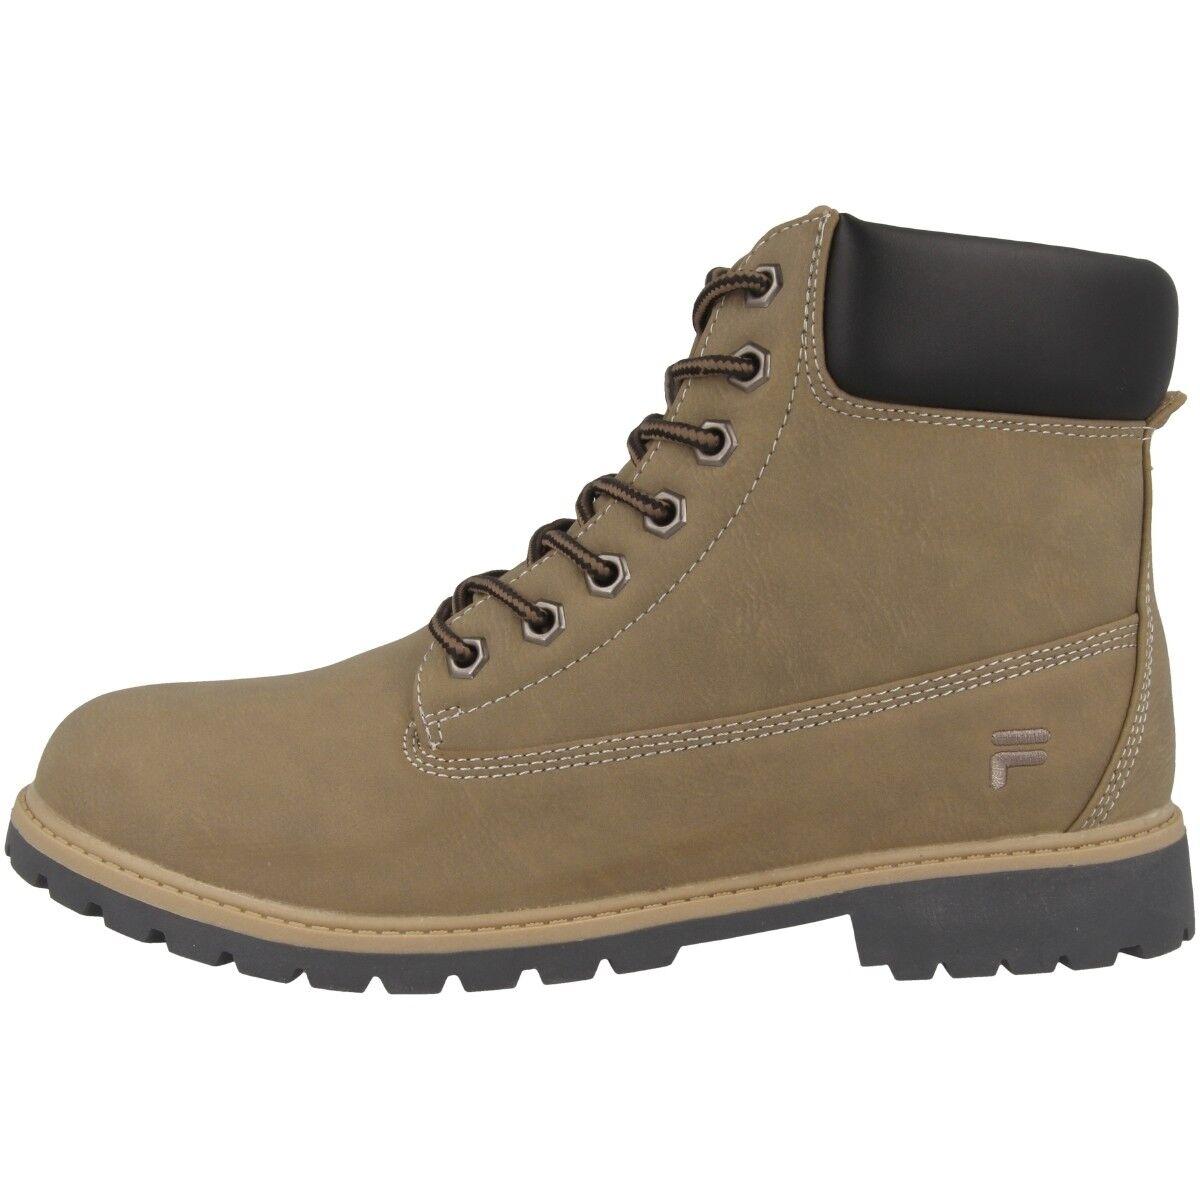 Fila Maverick Mid Schuhe Herren Outdoor Boots Hiking Stiefel 1010145.6BW Grunge